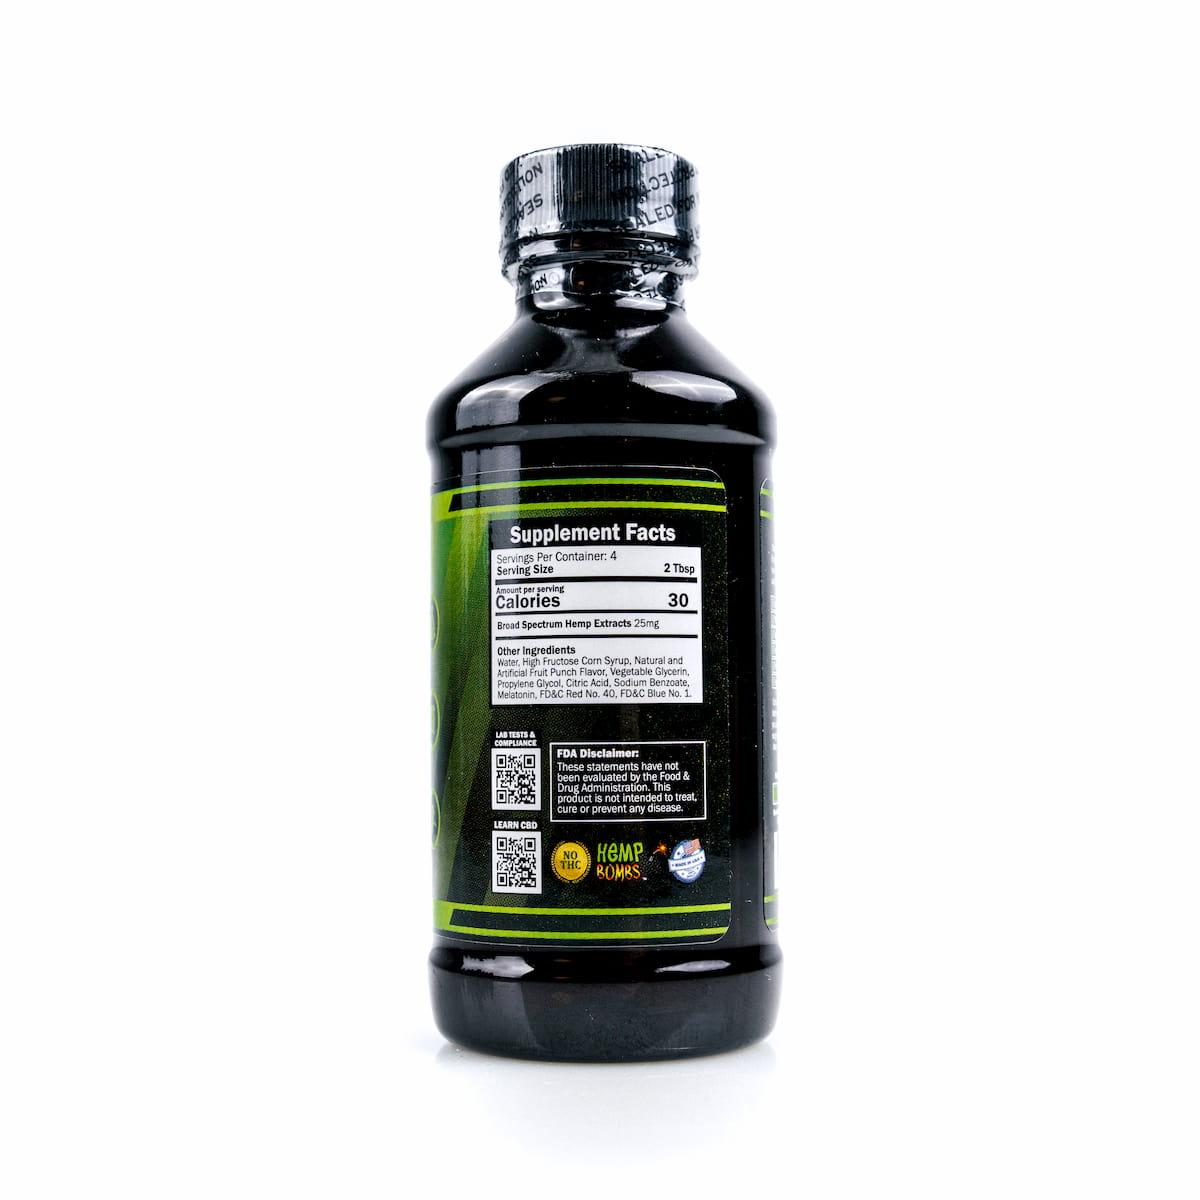 Hemp Bombs, CBD Relaxation Syrup, 4oz, 100mg of CBD 3